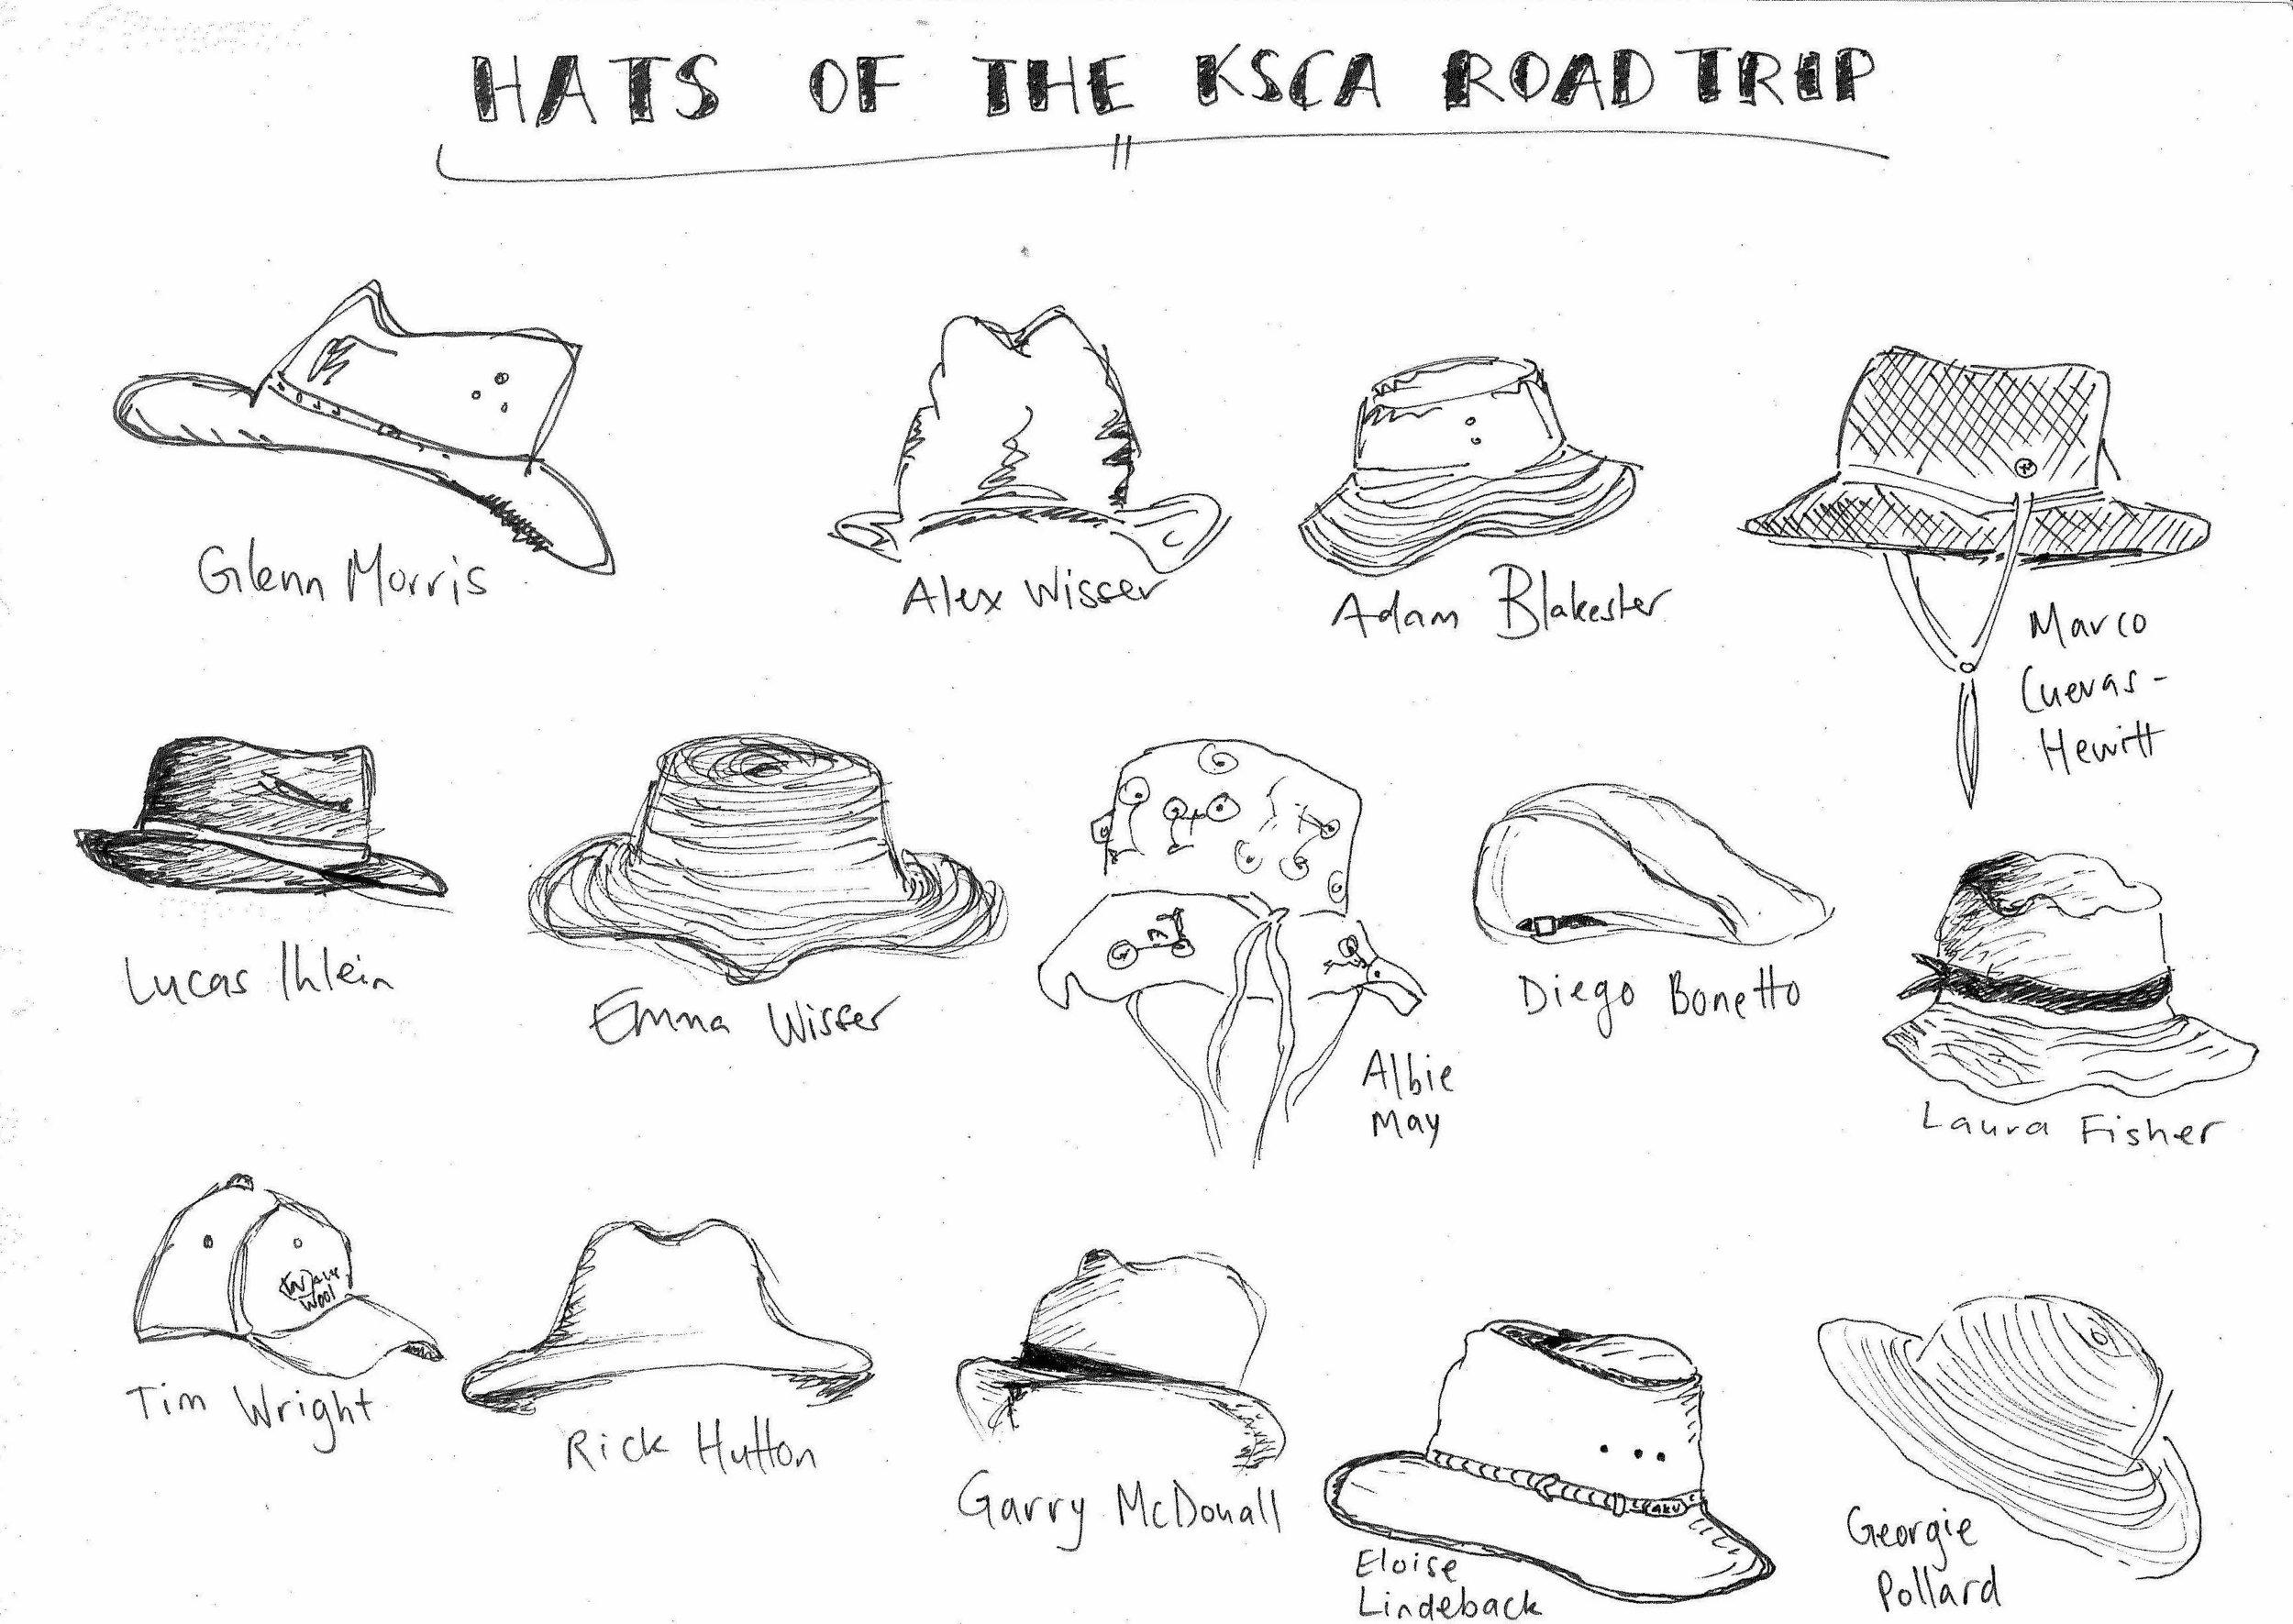 hat-scan-jpeg-4.jpg